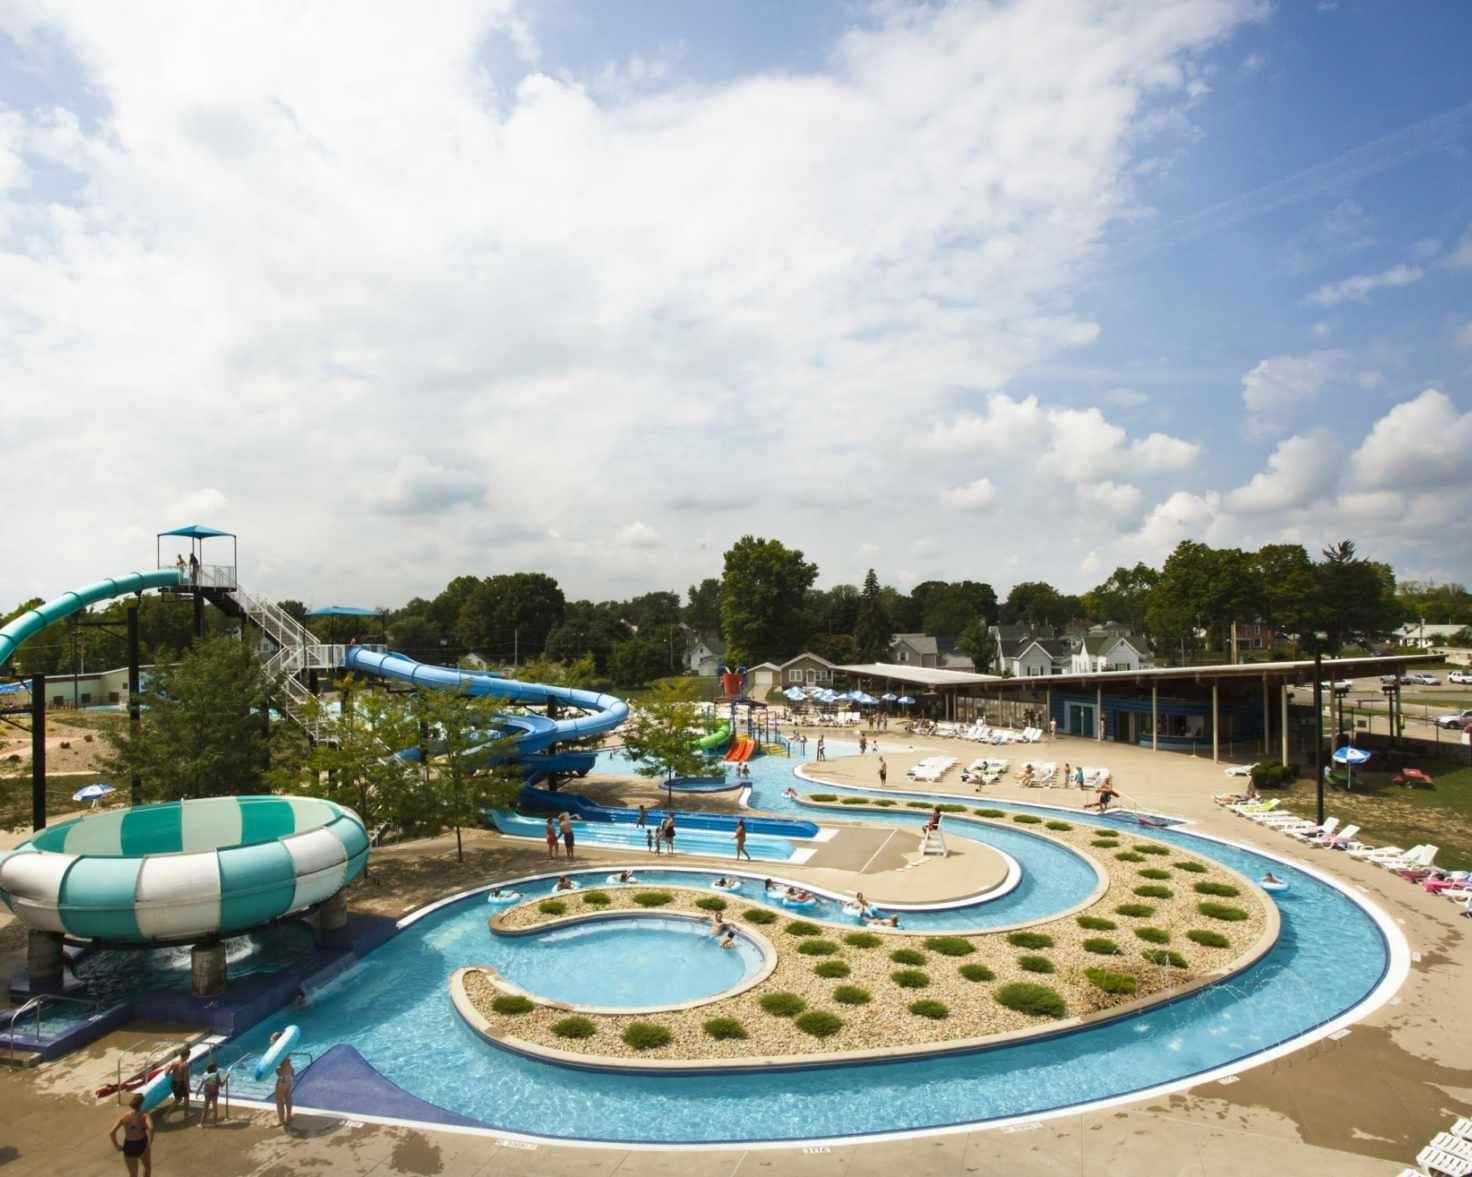 Parque acuático Splash House Indiana